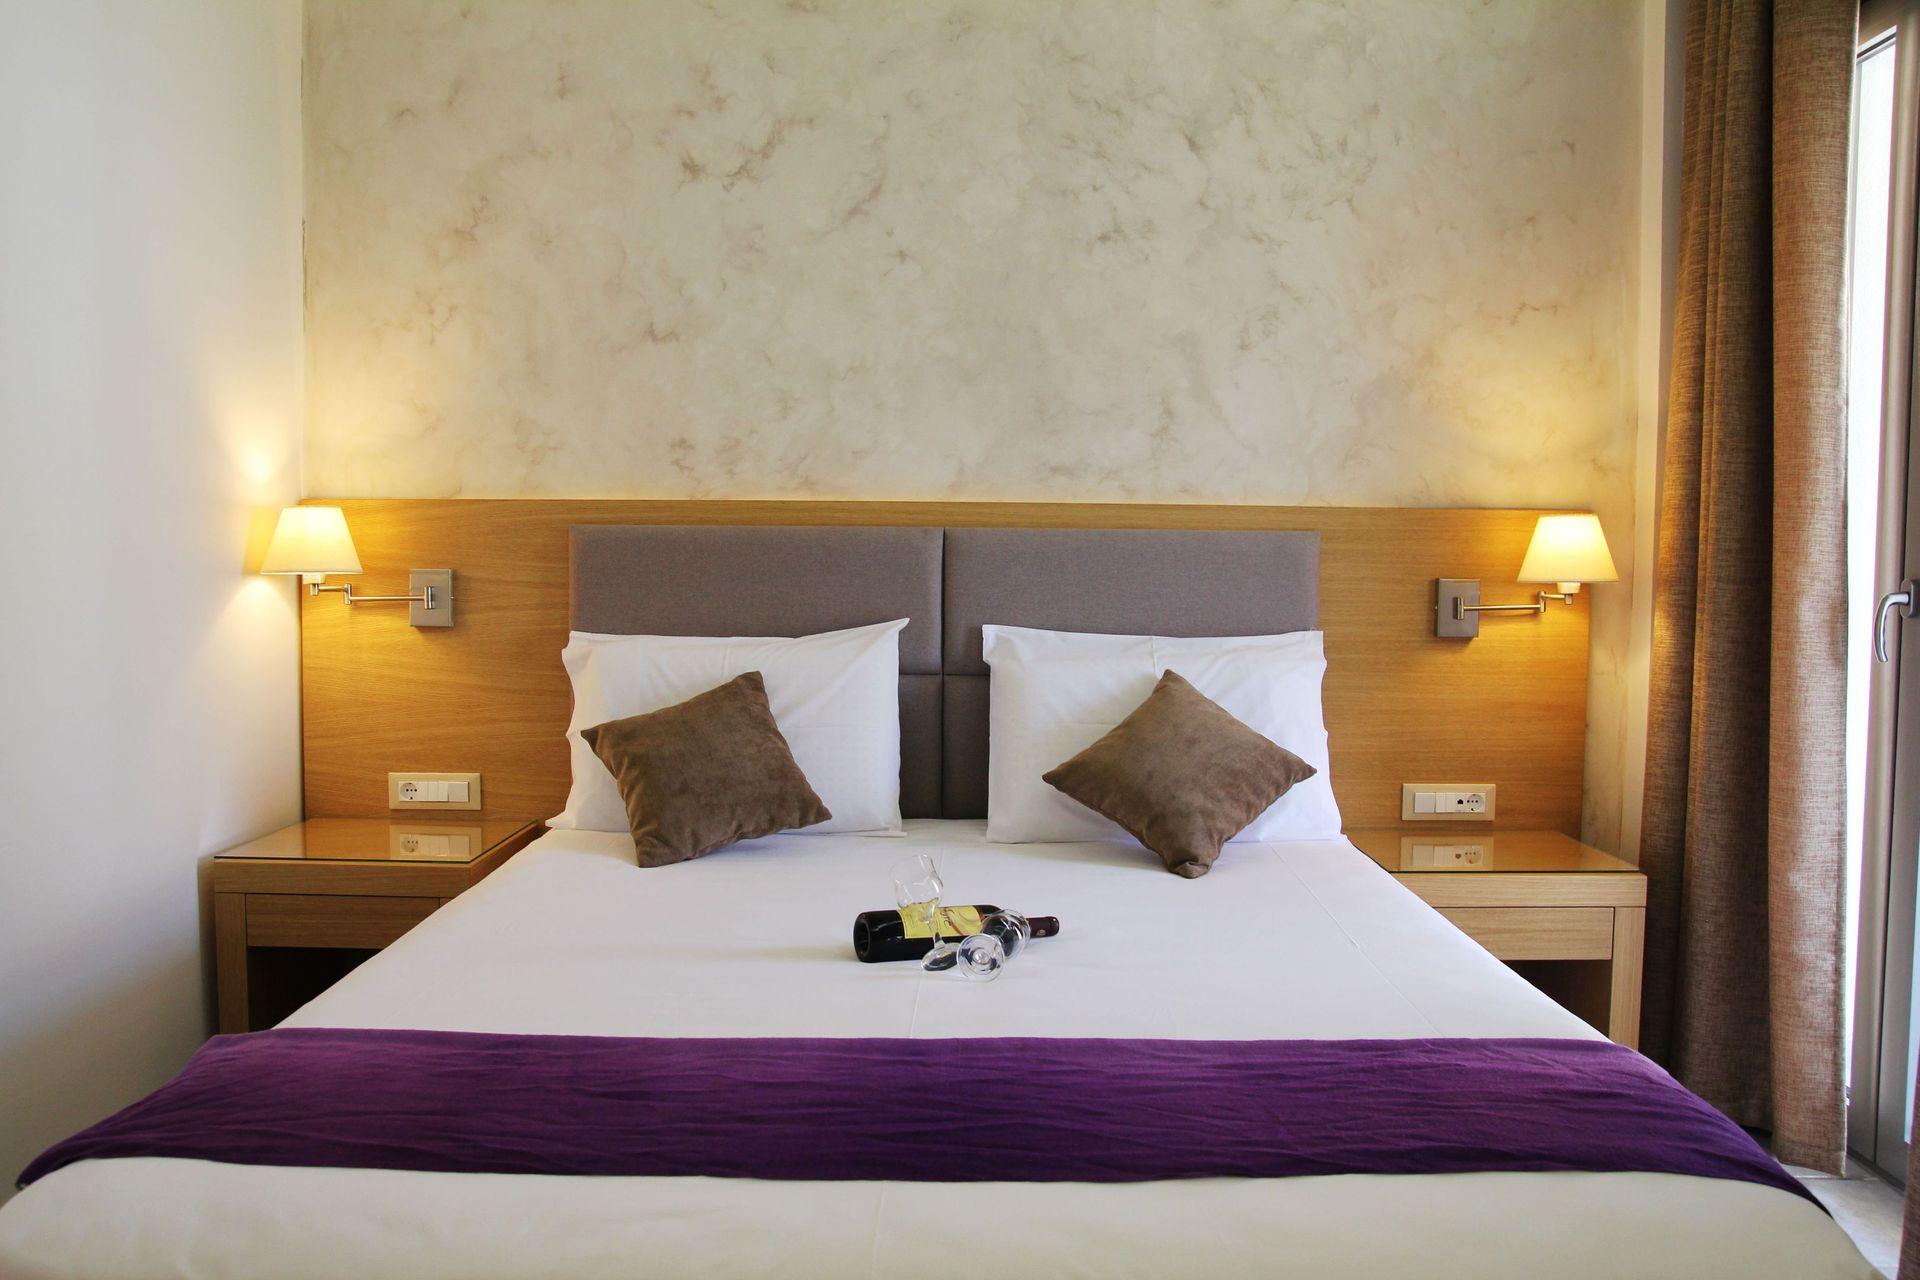 Achilles Hotel Methoni - Μεθώνη, Μεσσηνία ✦ 3 Ημέρες